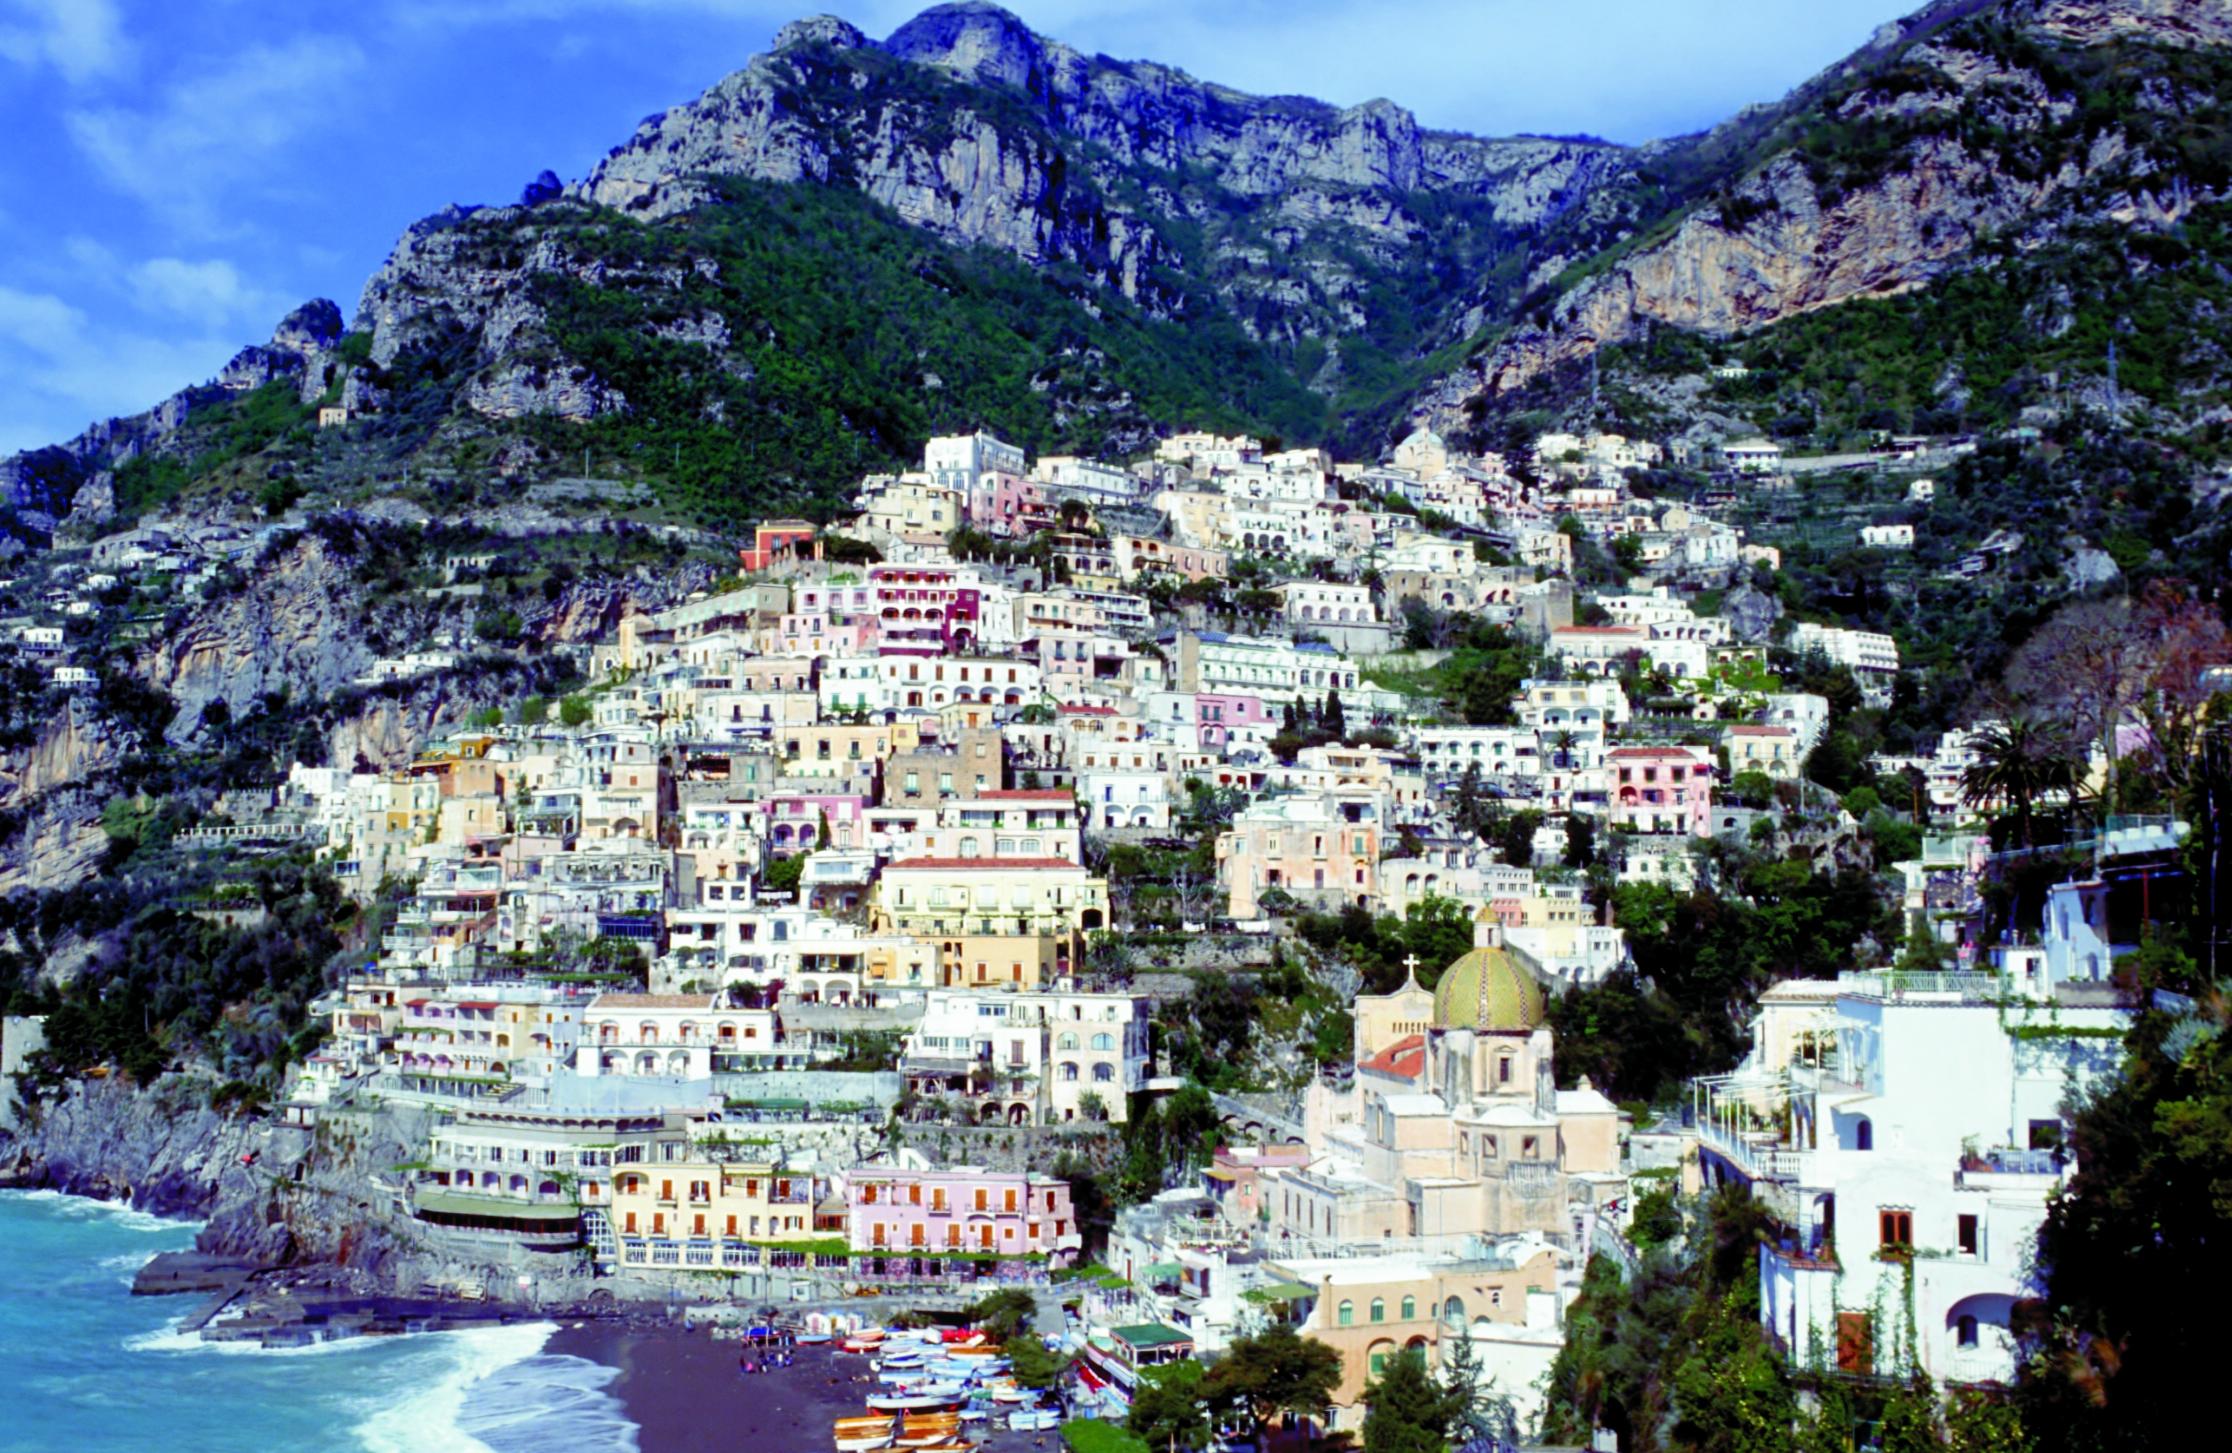 Amalfi Coast - itsaly